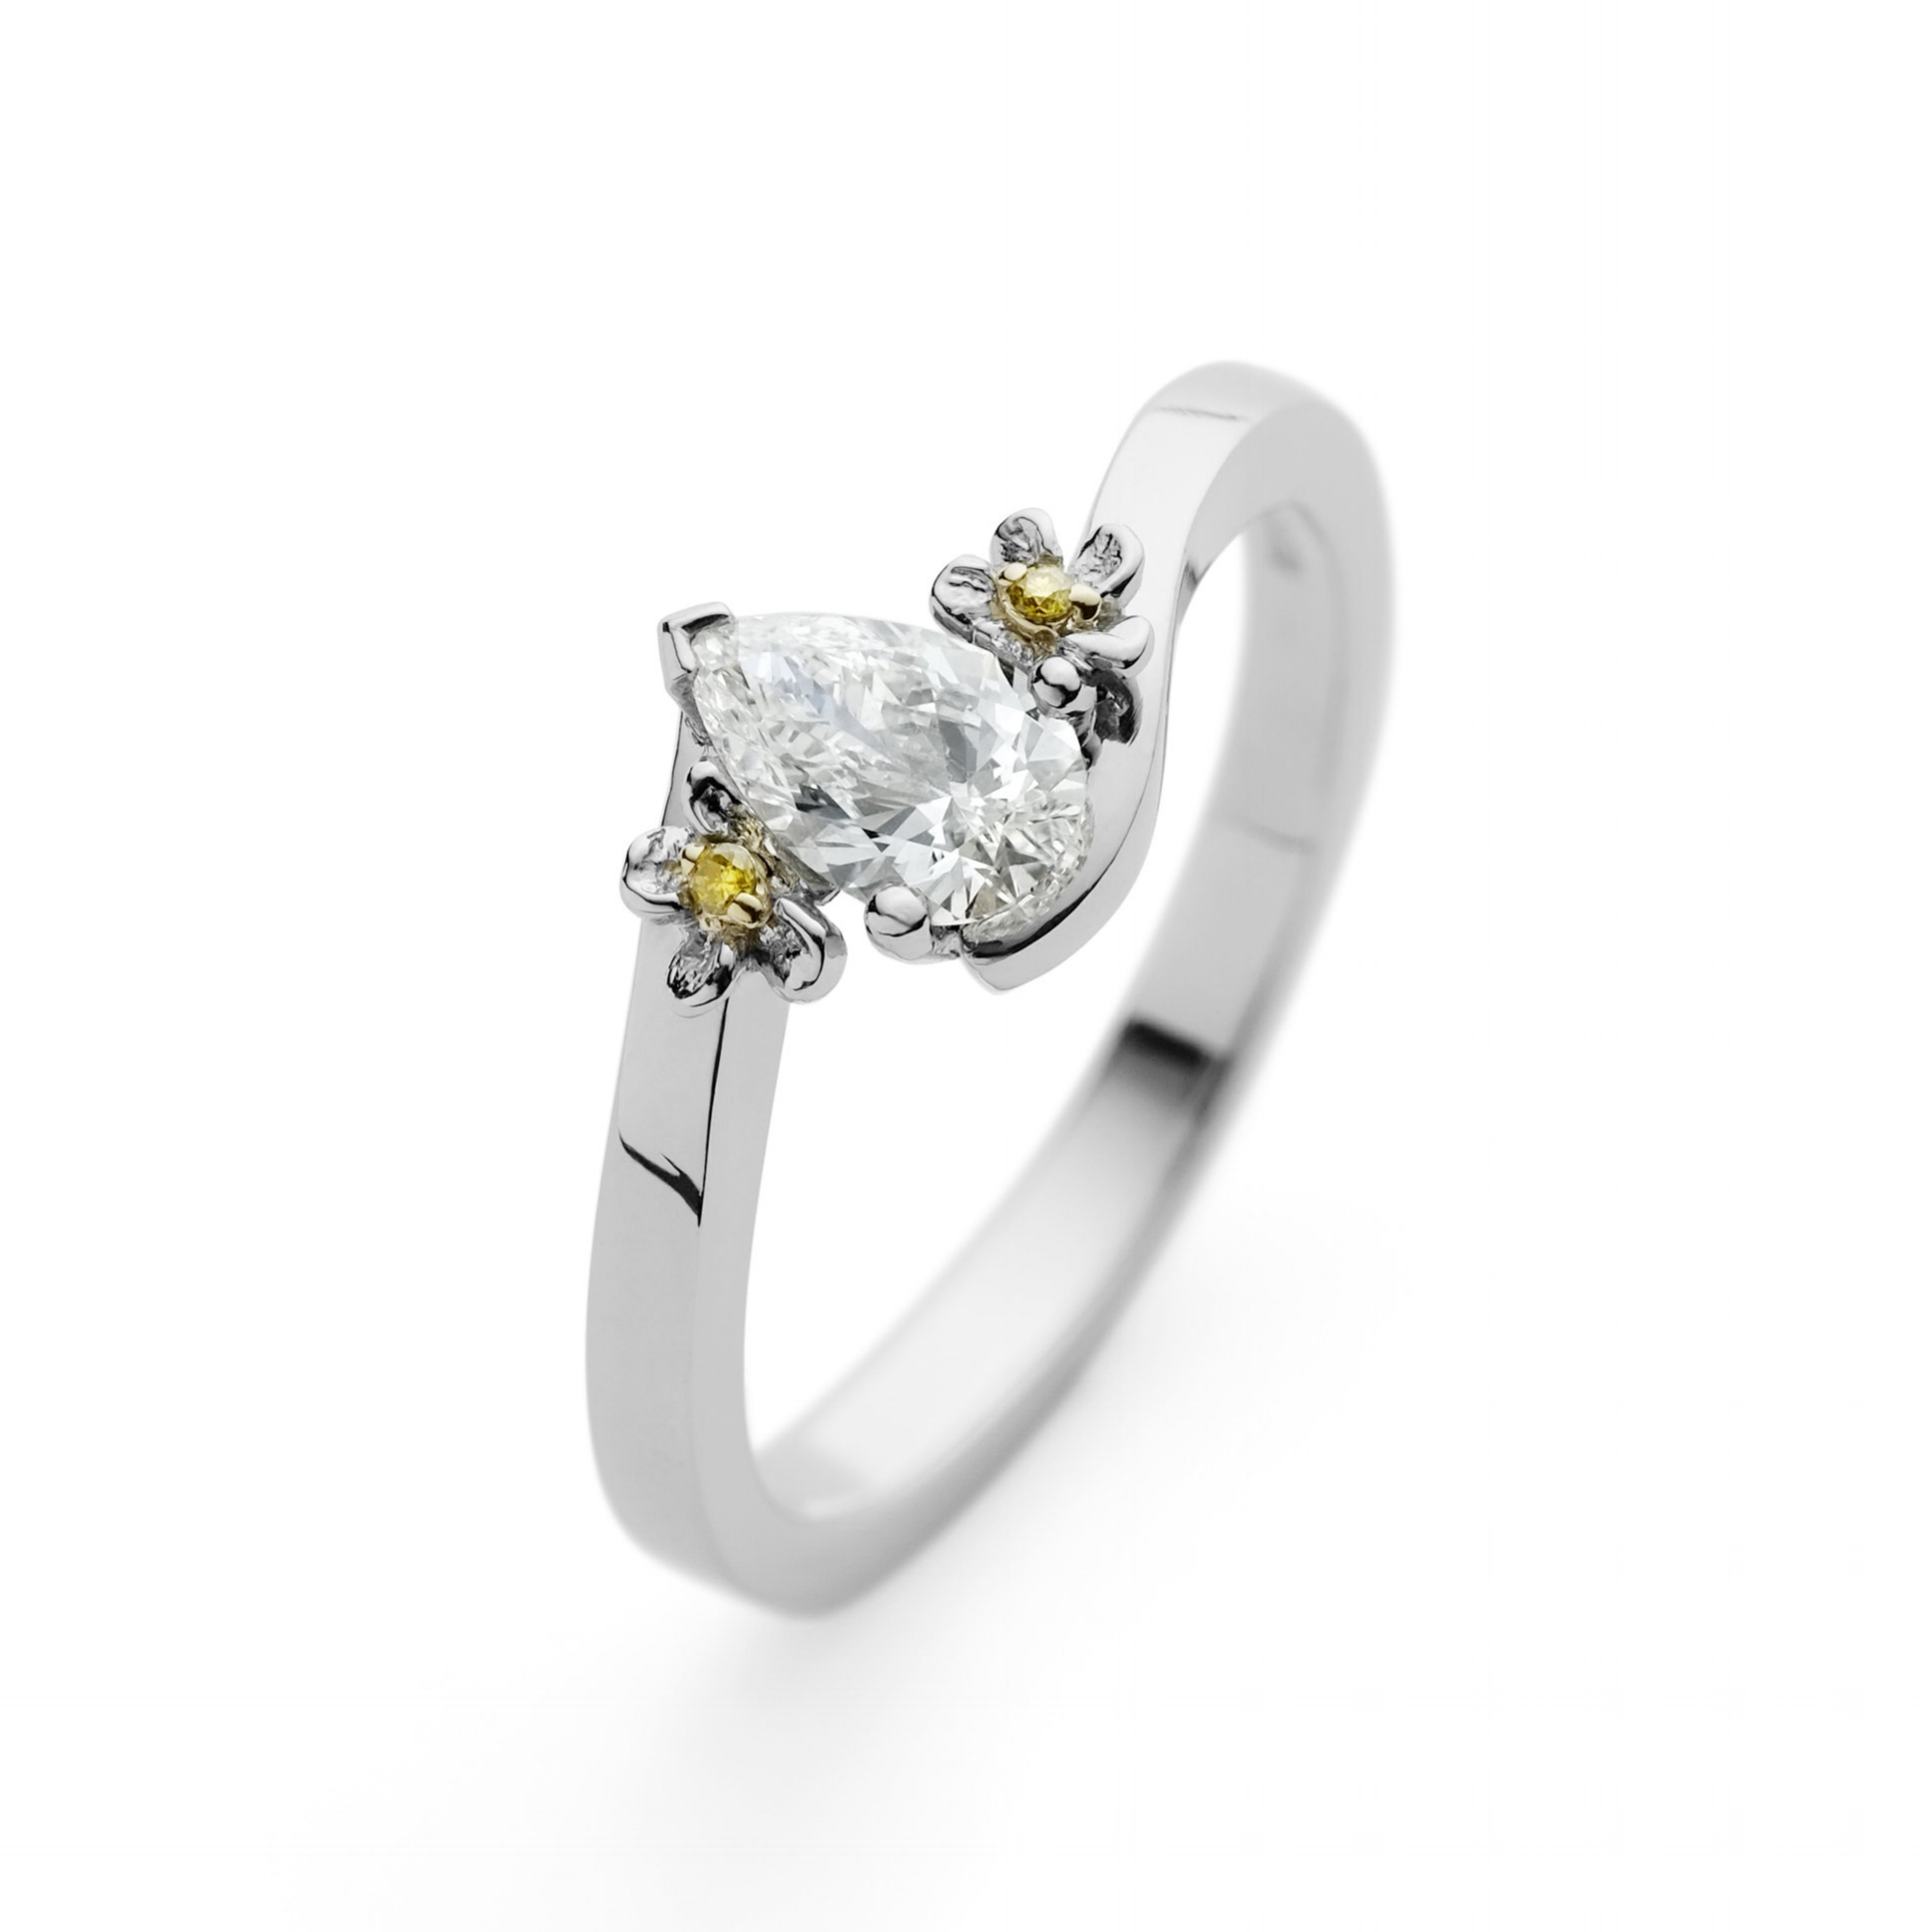 Yvonne engagement ring